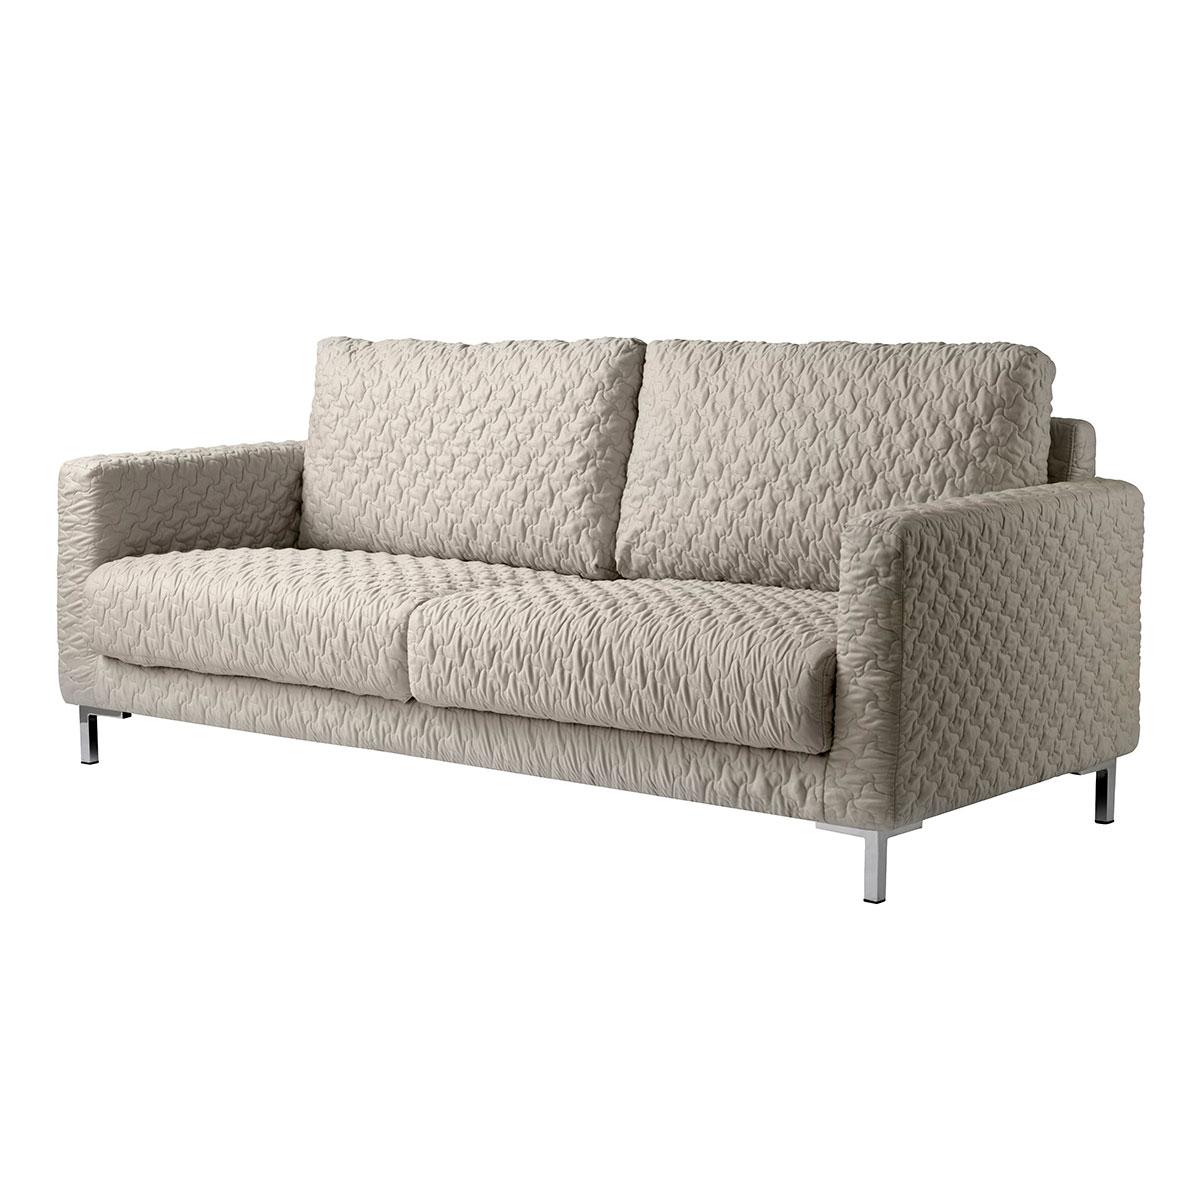 Image of   Living&more 3 pers. sofa - Aya - Sand